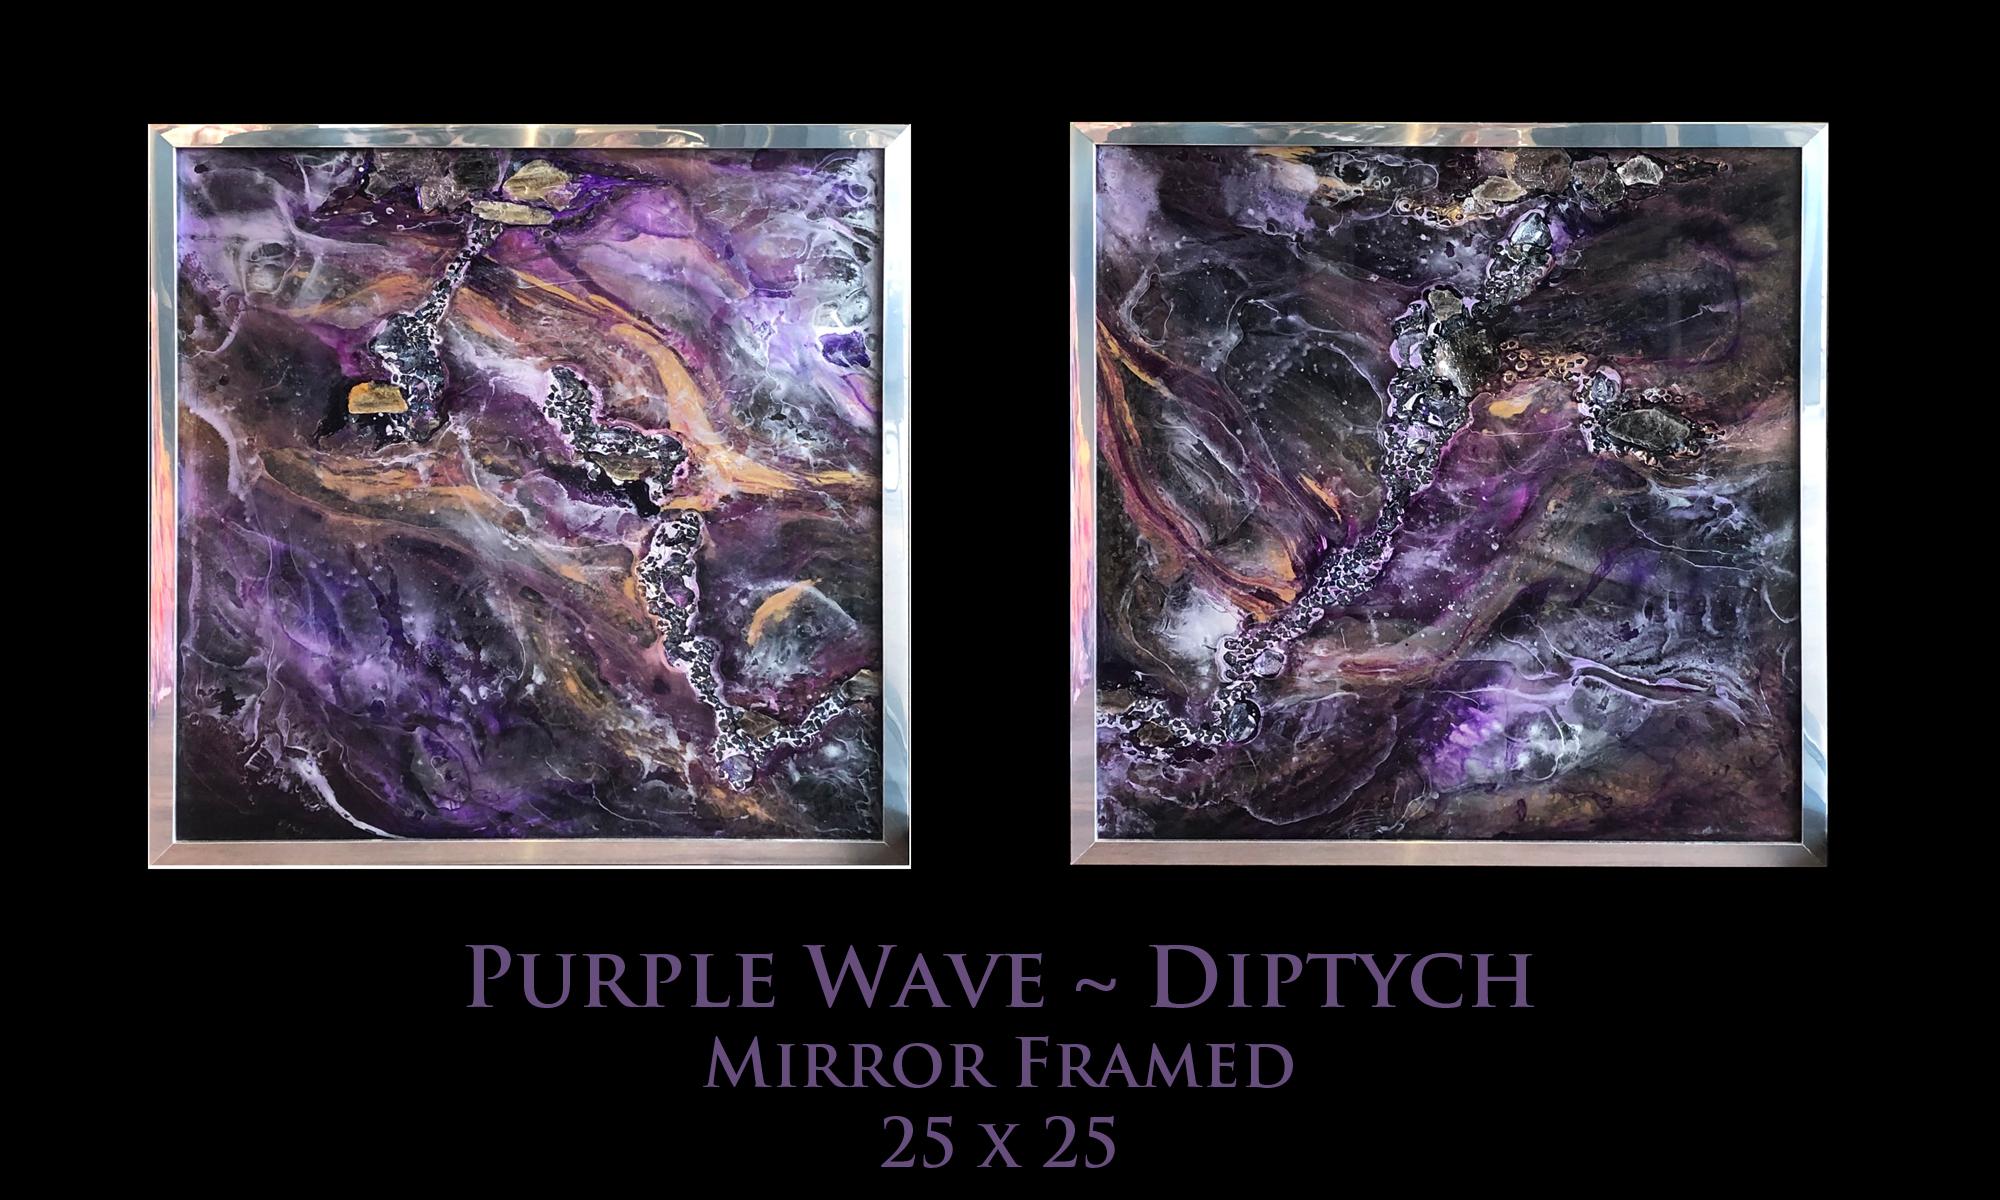 Purple Waves ~ Diptych